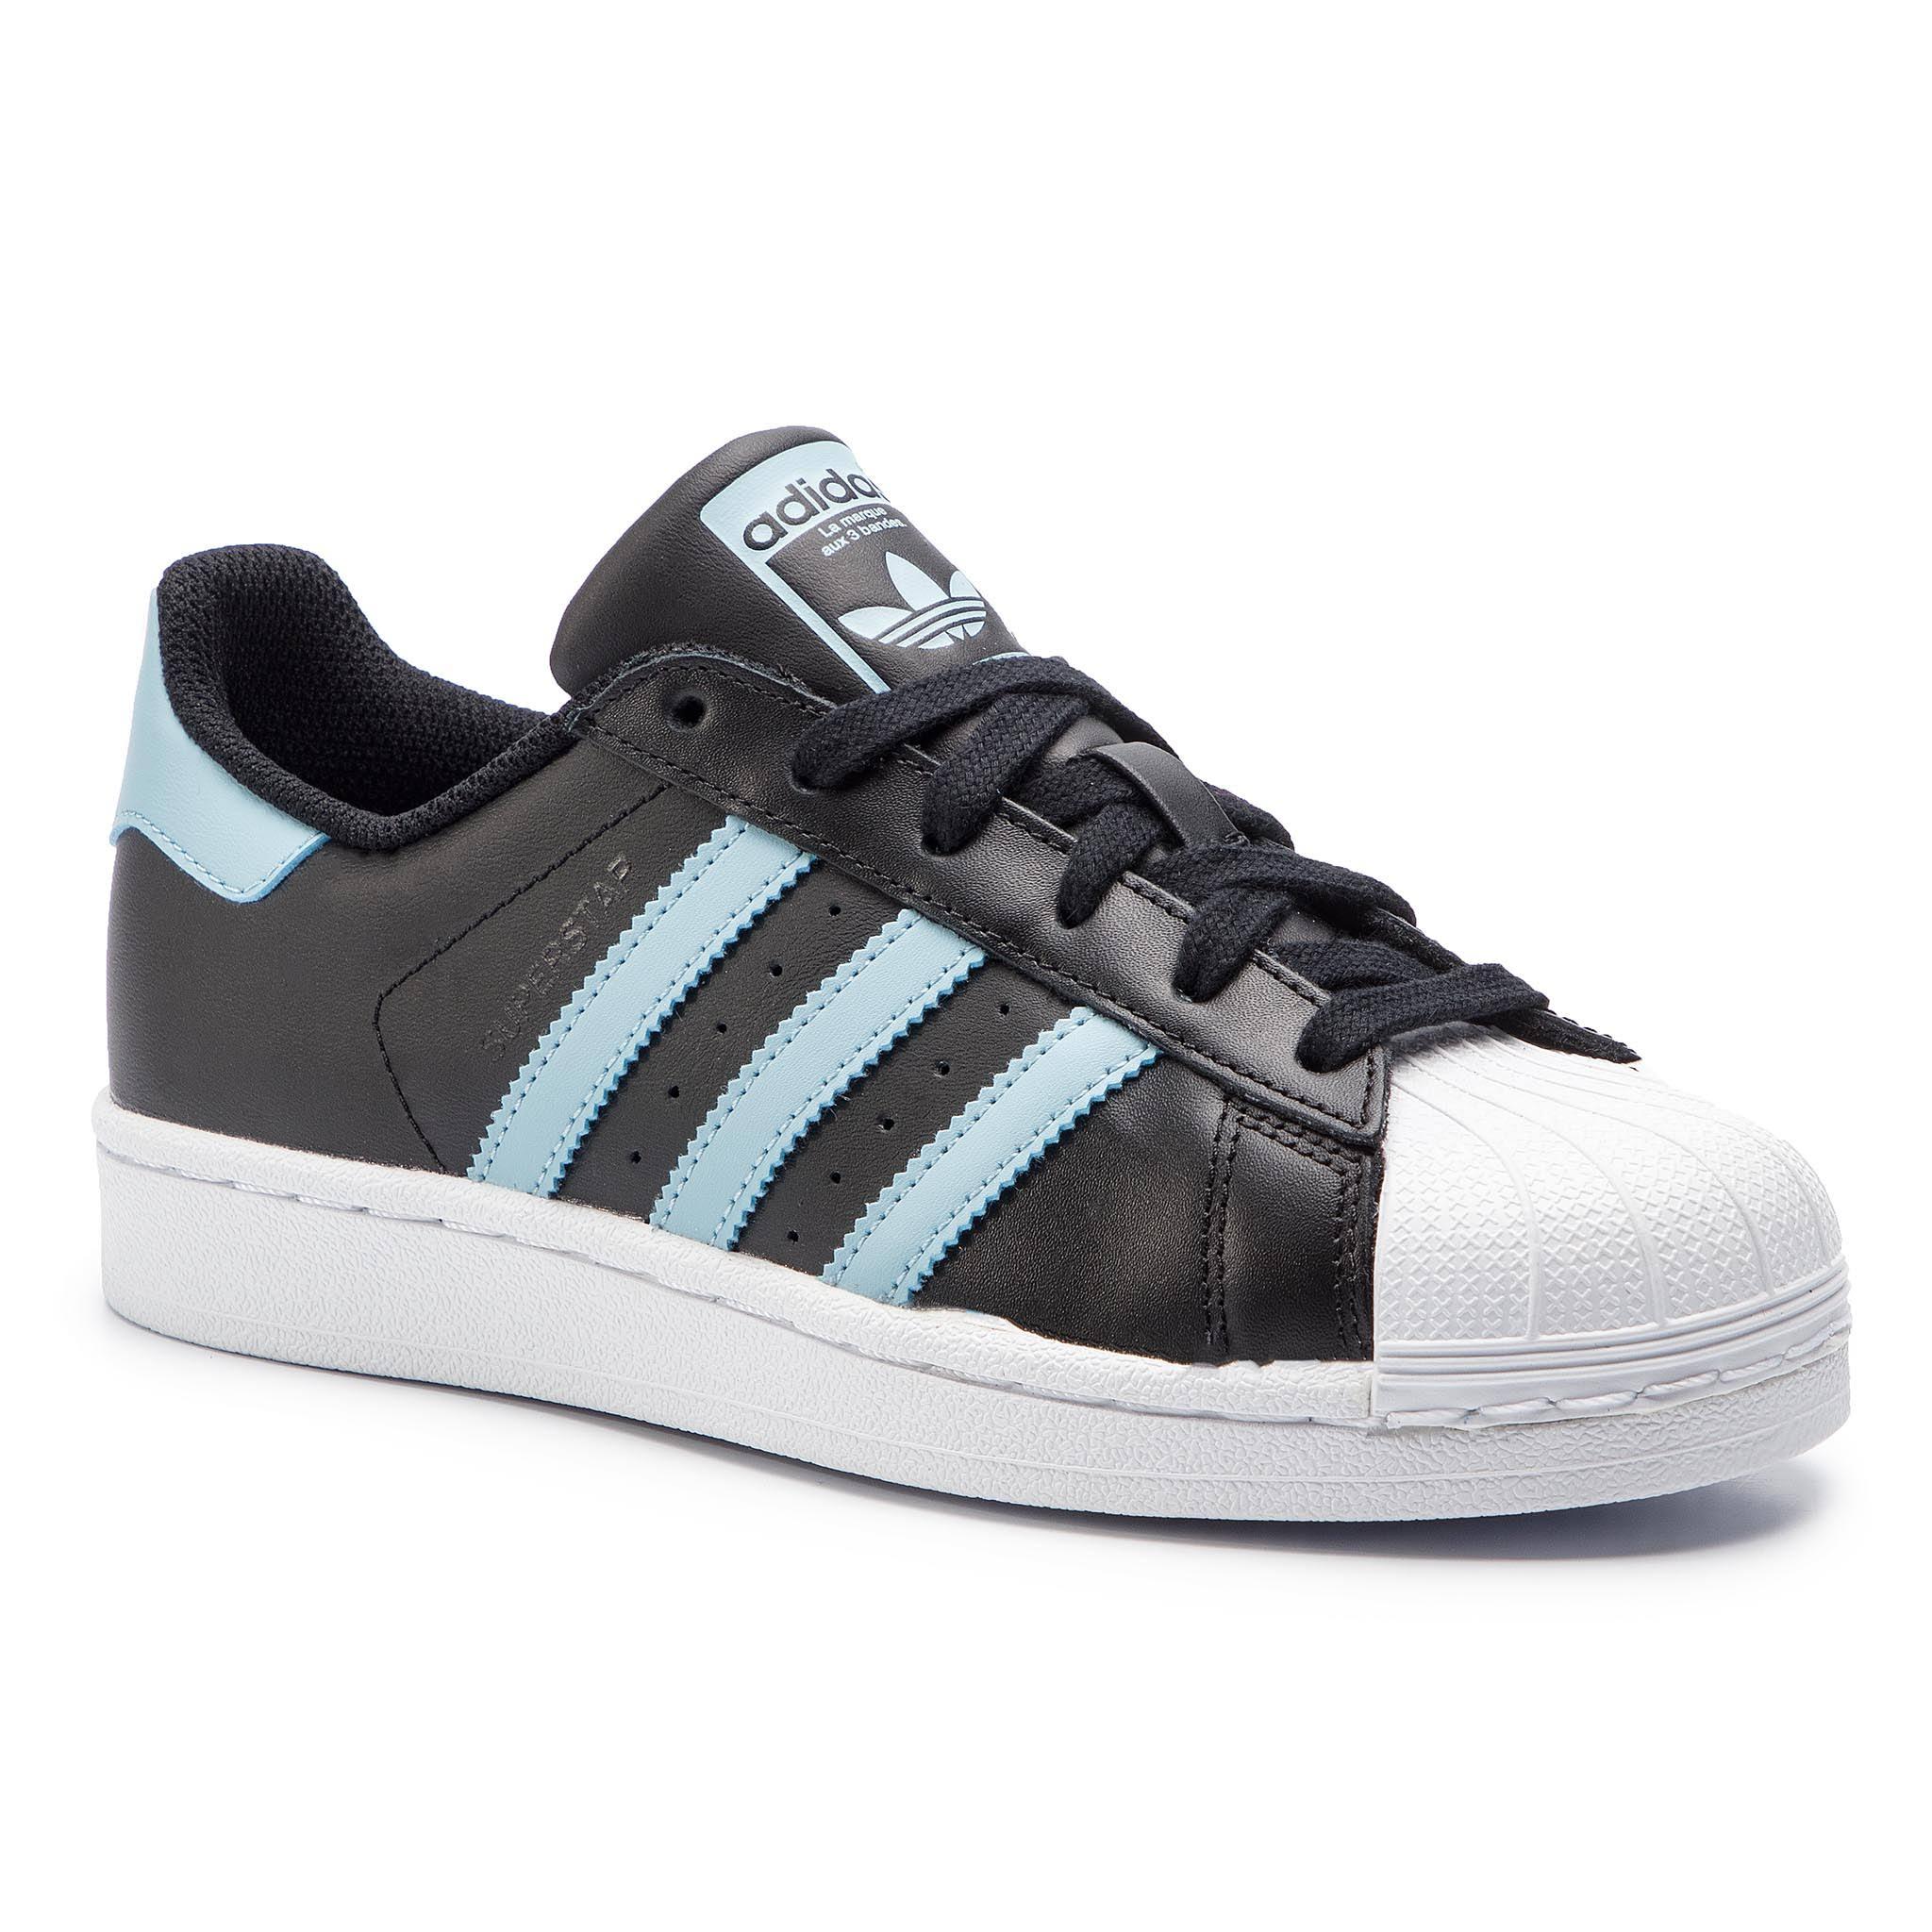 Shoe Shoe Adidas Superstar Colorblack Colorblack Adidas Superstar YW2EDH9I